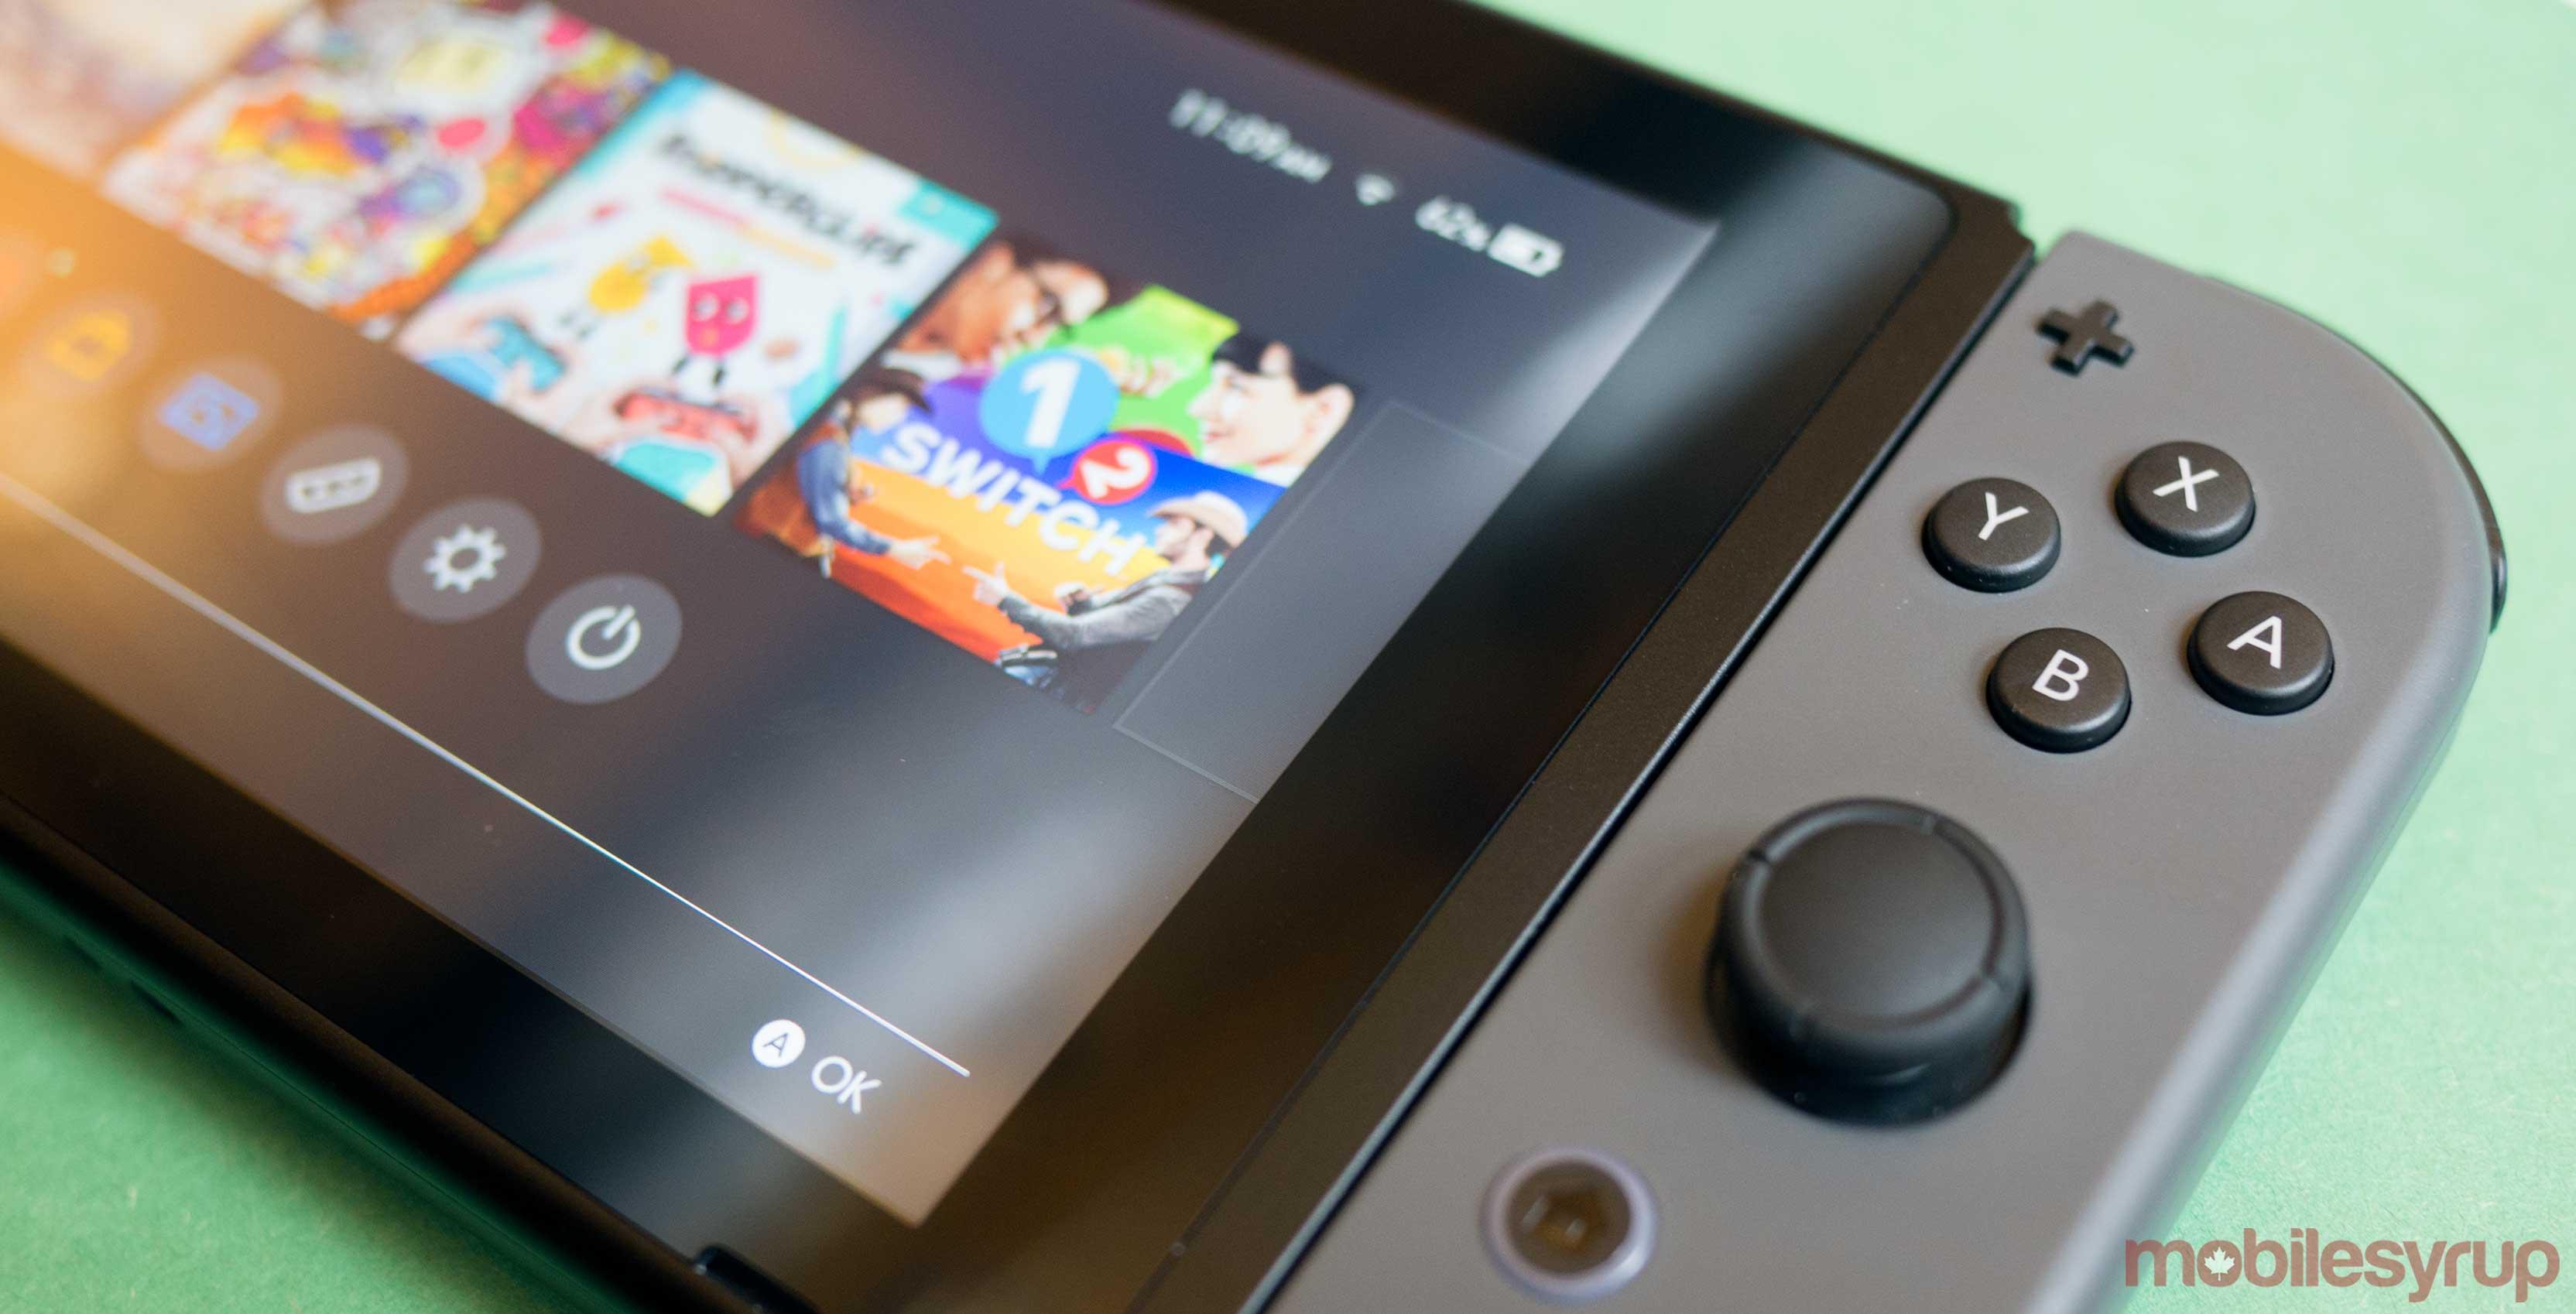 Nintendo Switch side view